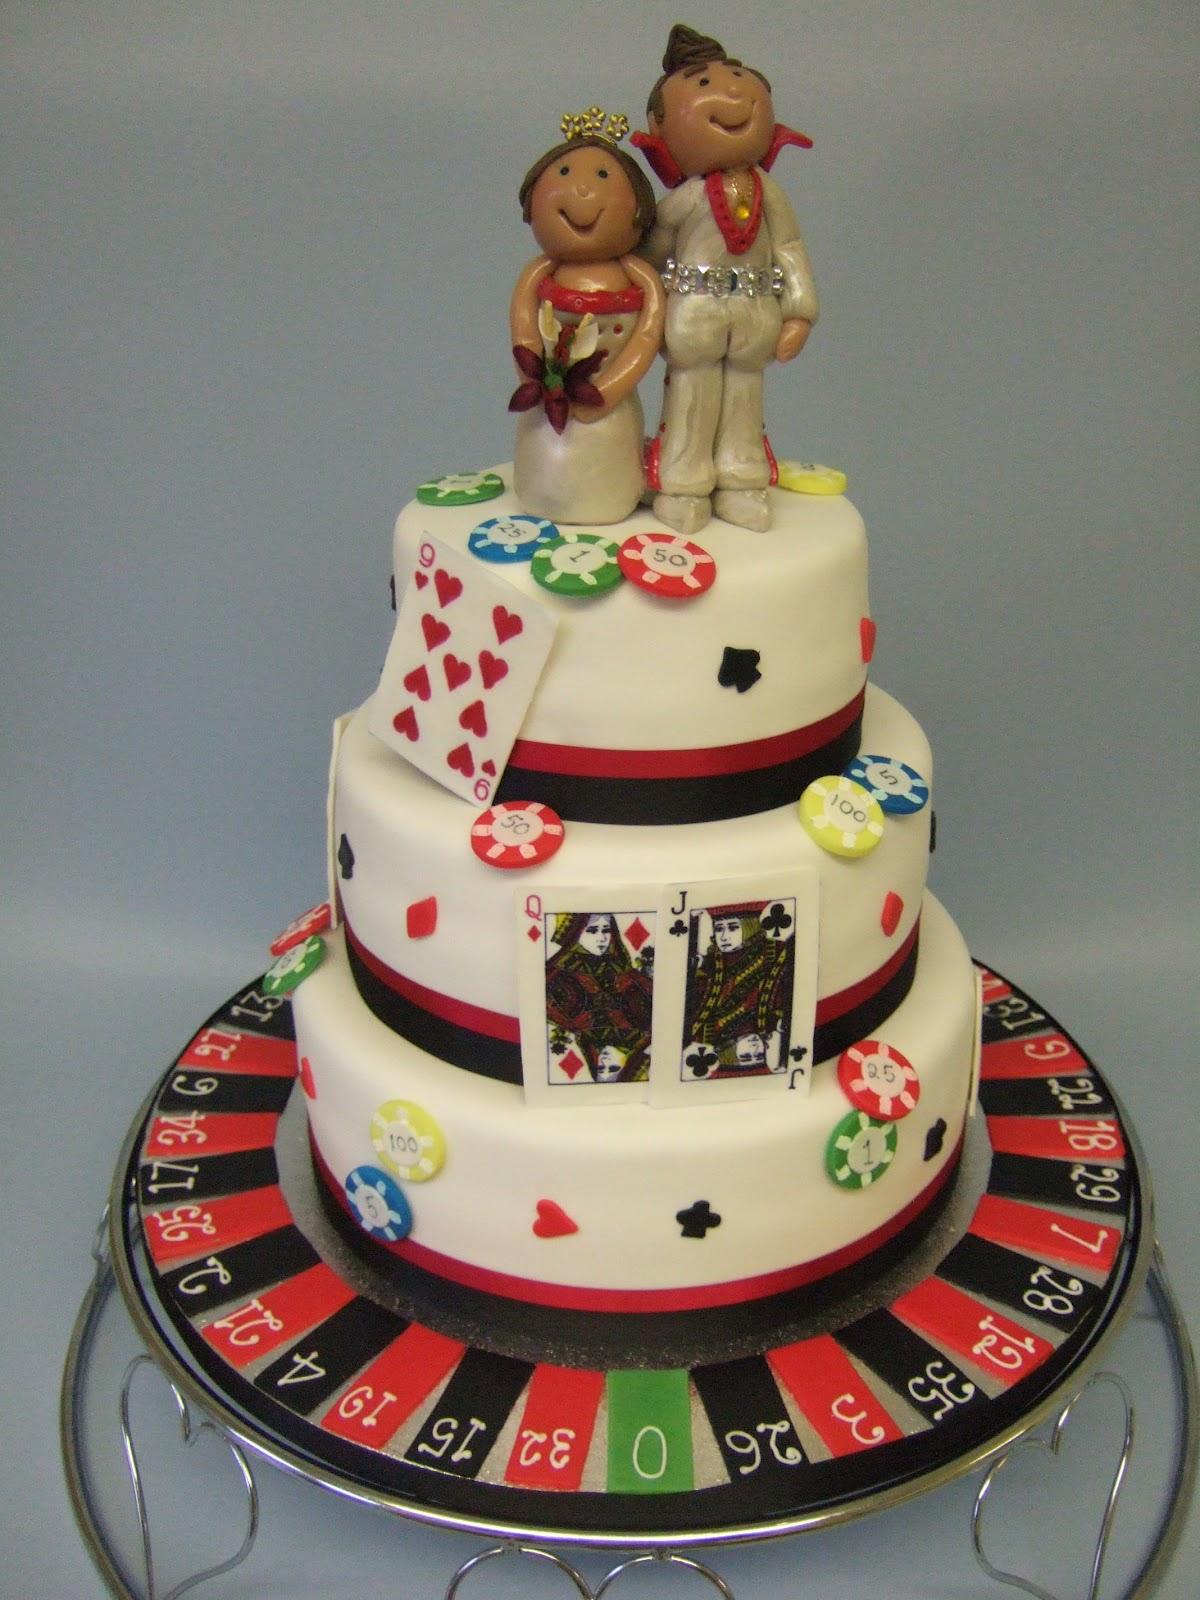 wedding cakes pictures las vegas wedding cake. Black Bedroom Furniture Sets. Home Design Ideas